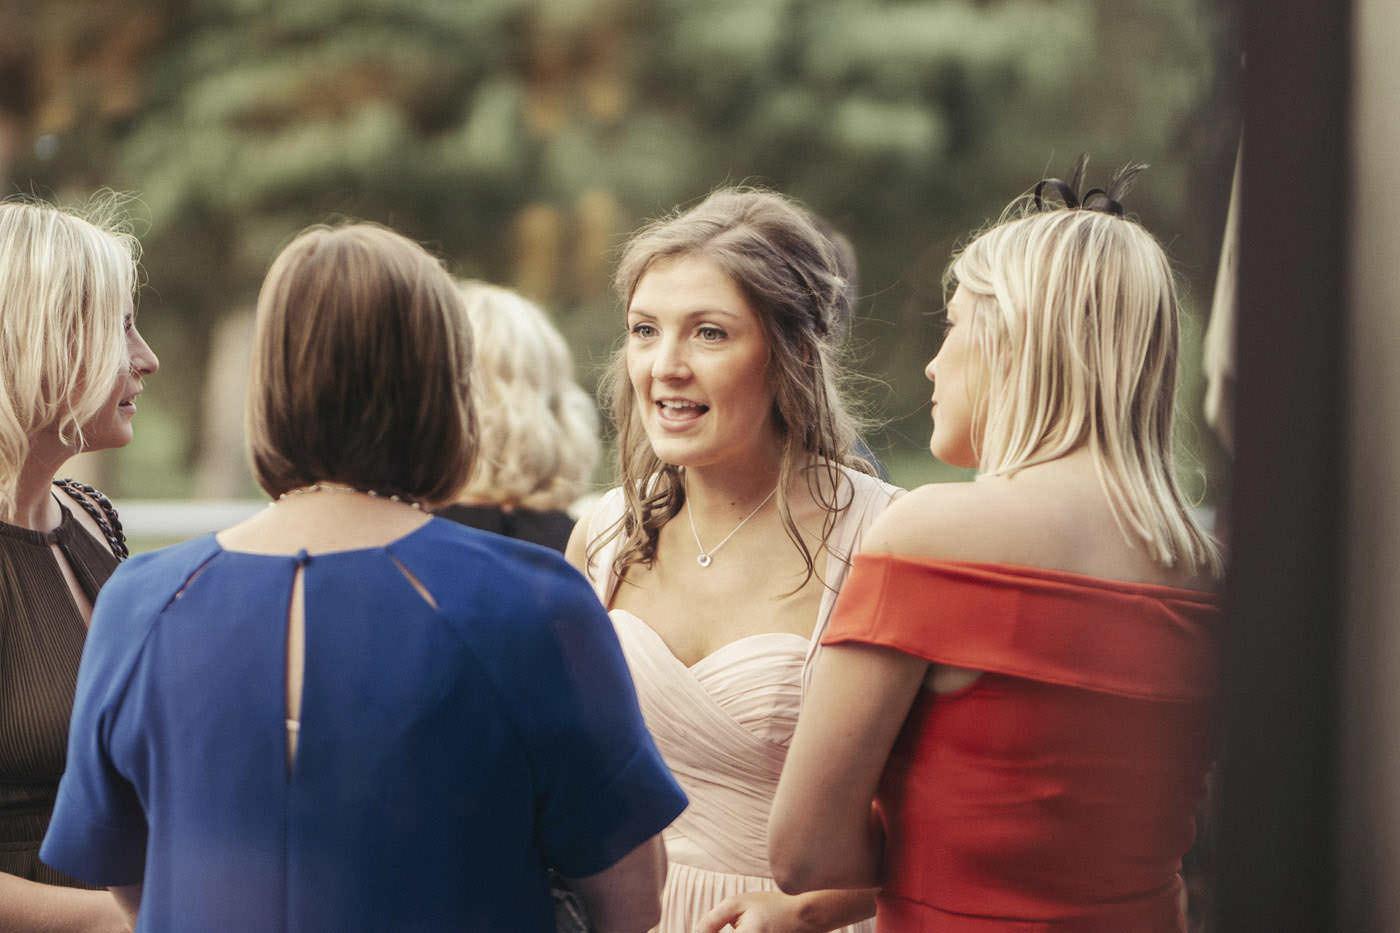 lukeemily foxhills wedding photographer 0134